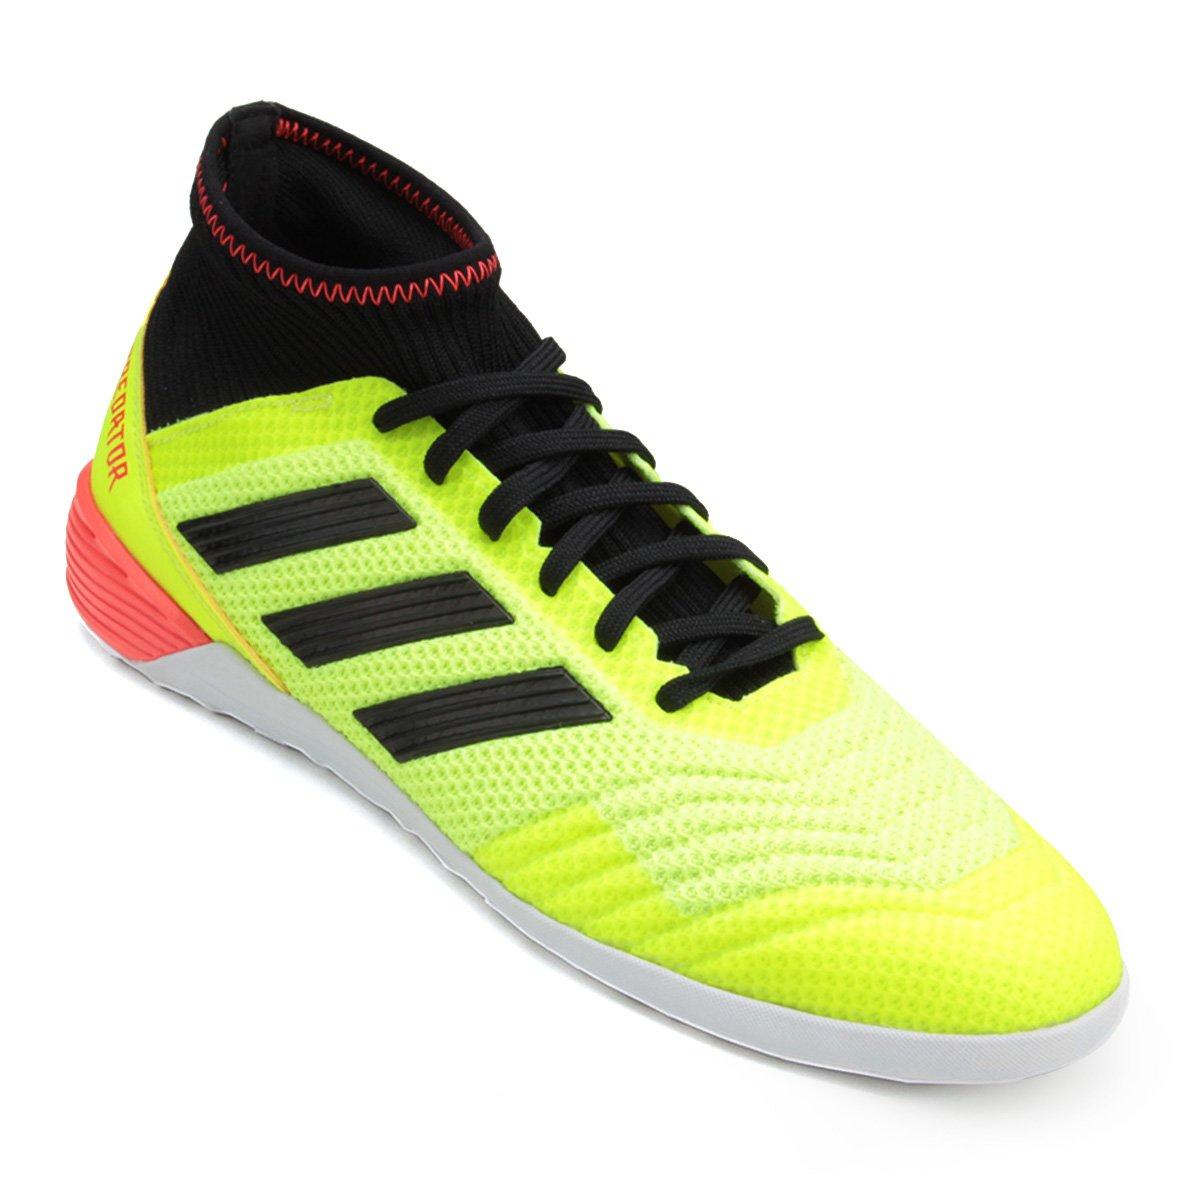 c7b062da10bb6 Chuteira Futsal Adidas Predator Tan 18 3 IN - Amarelo e Preto - Compre  Agora